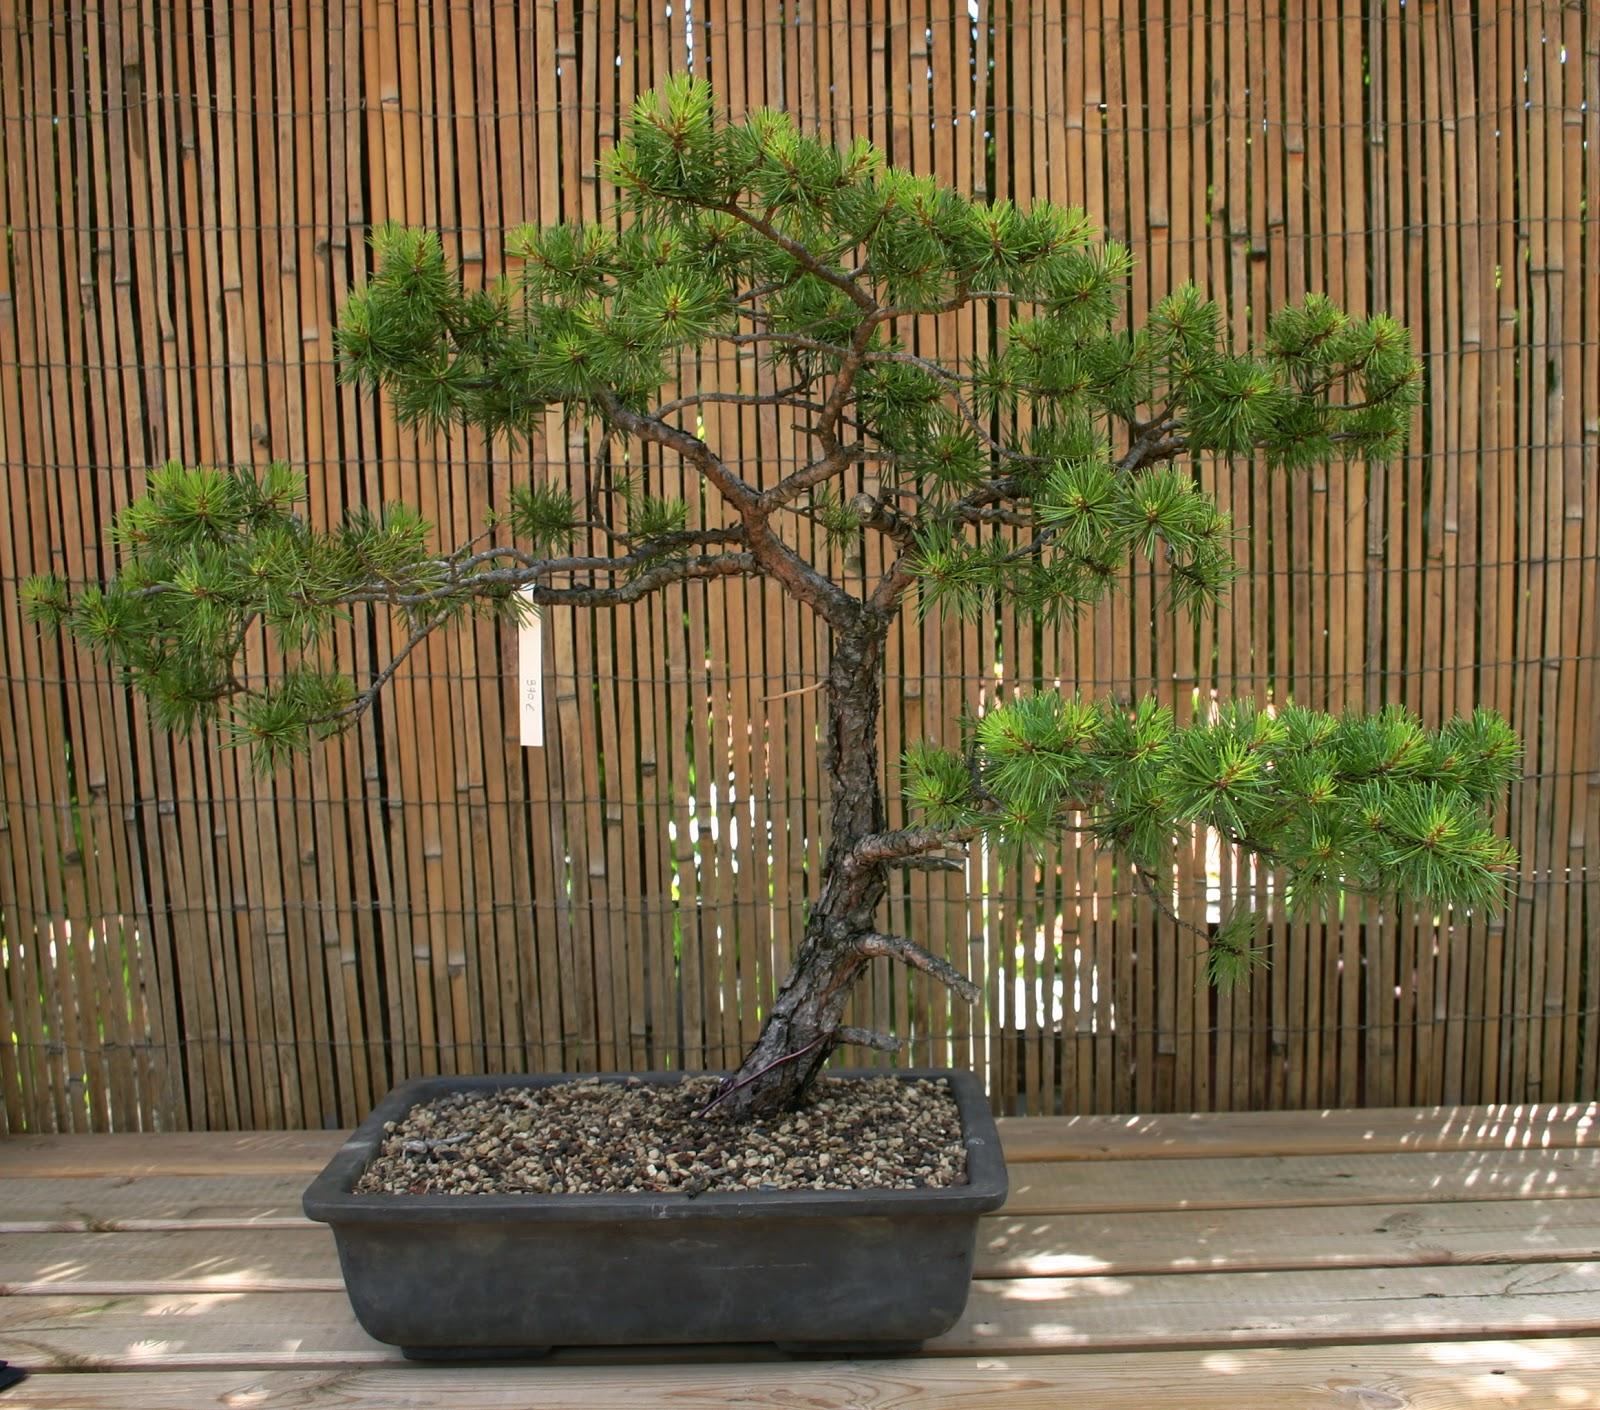 profession bonsa pins sylvestres bruts ou travaill s. Black Bedroom Furniture Sets. Home Design Ideas